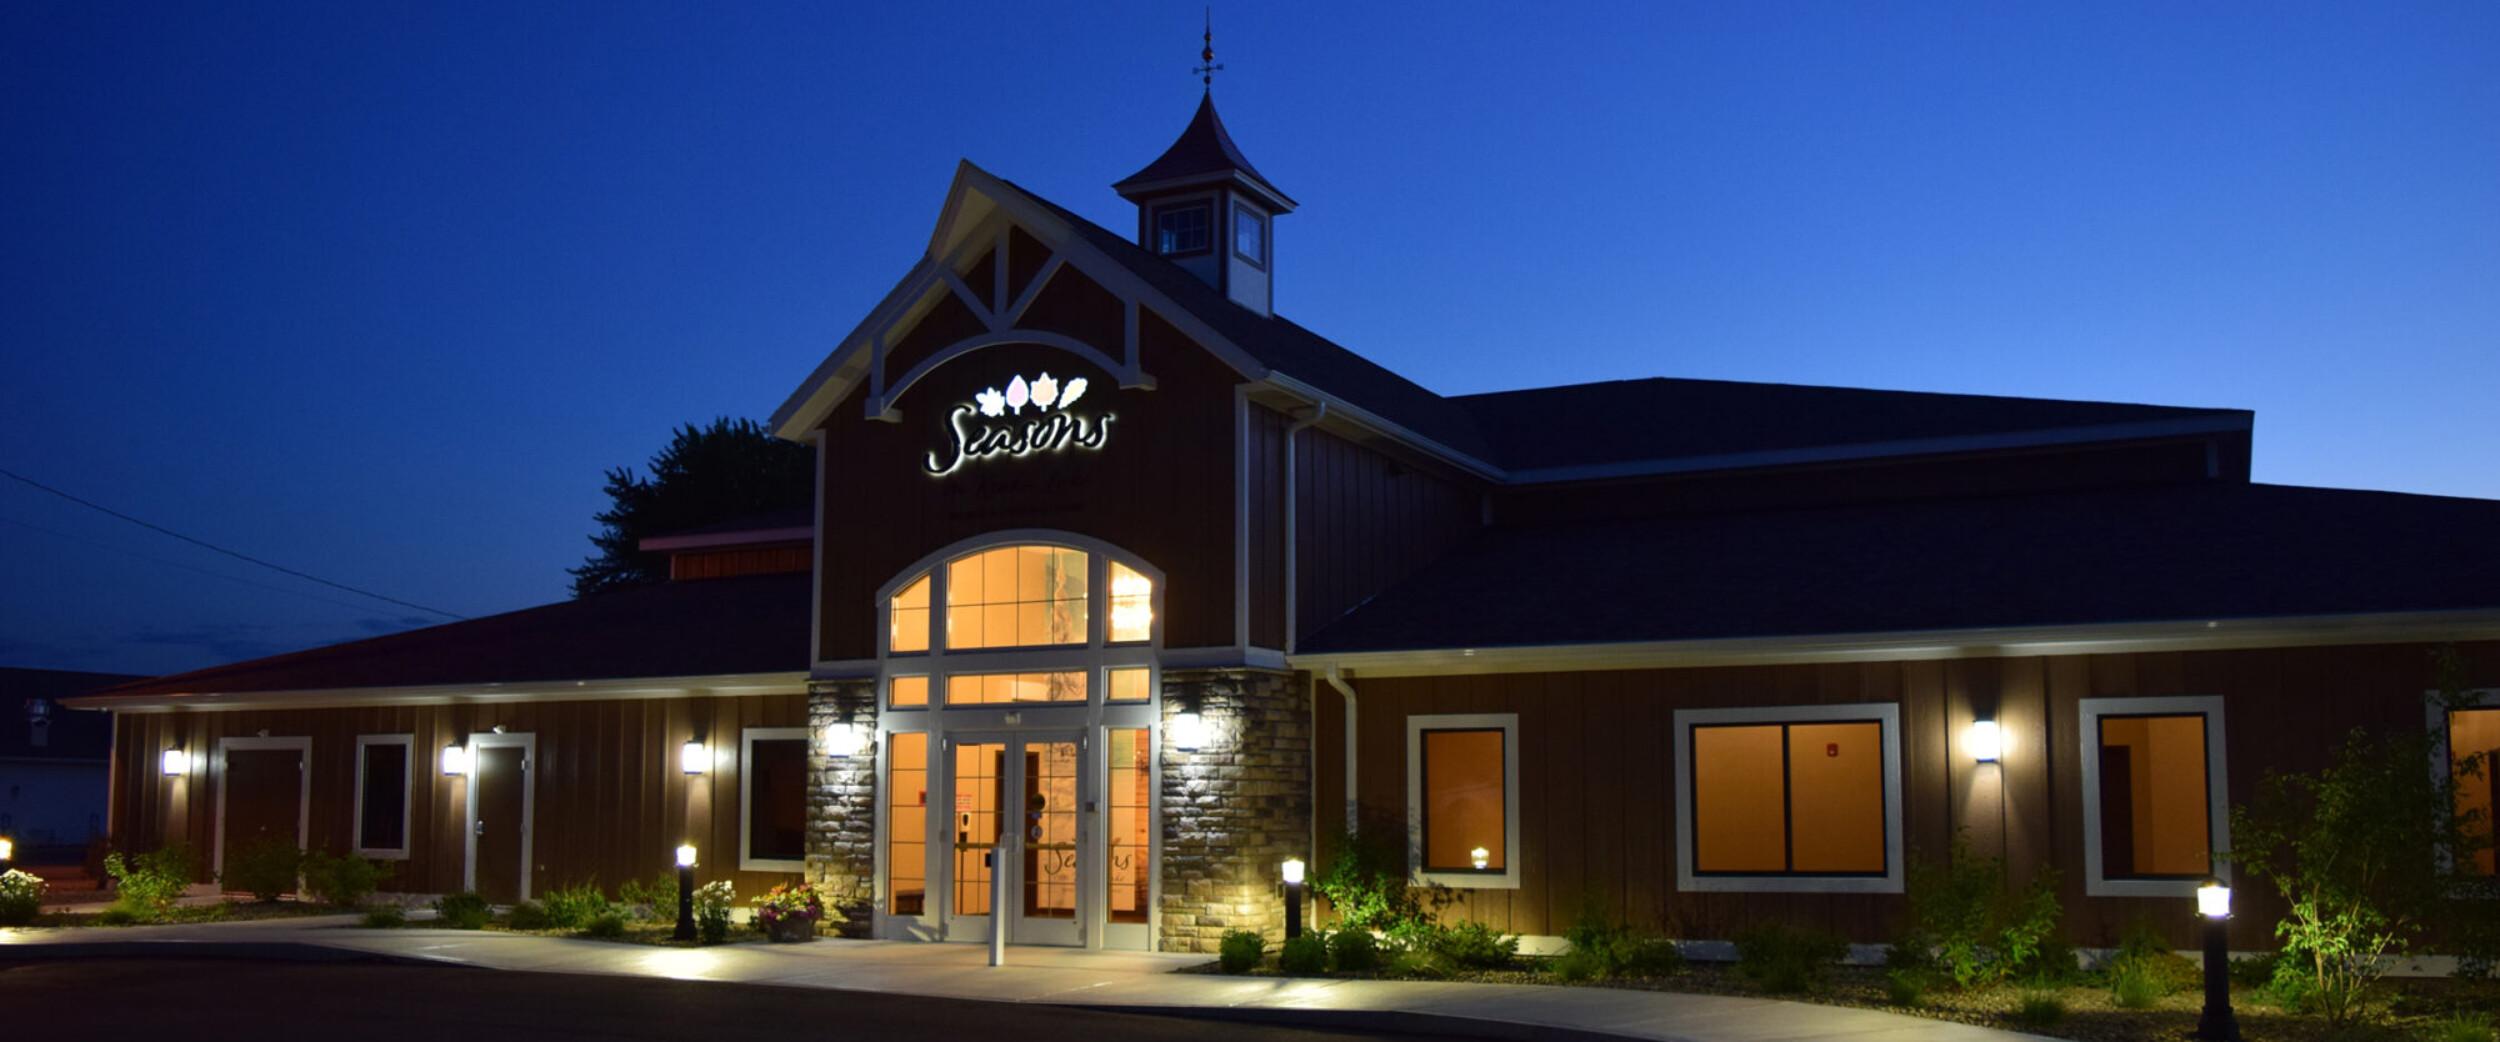 Seasons On Keuka Lake Banquet Conference Center Front Entrance Night